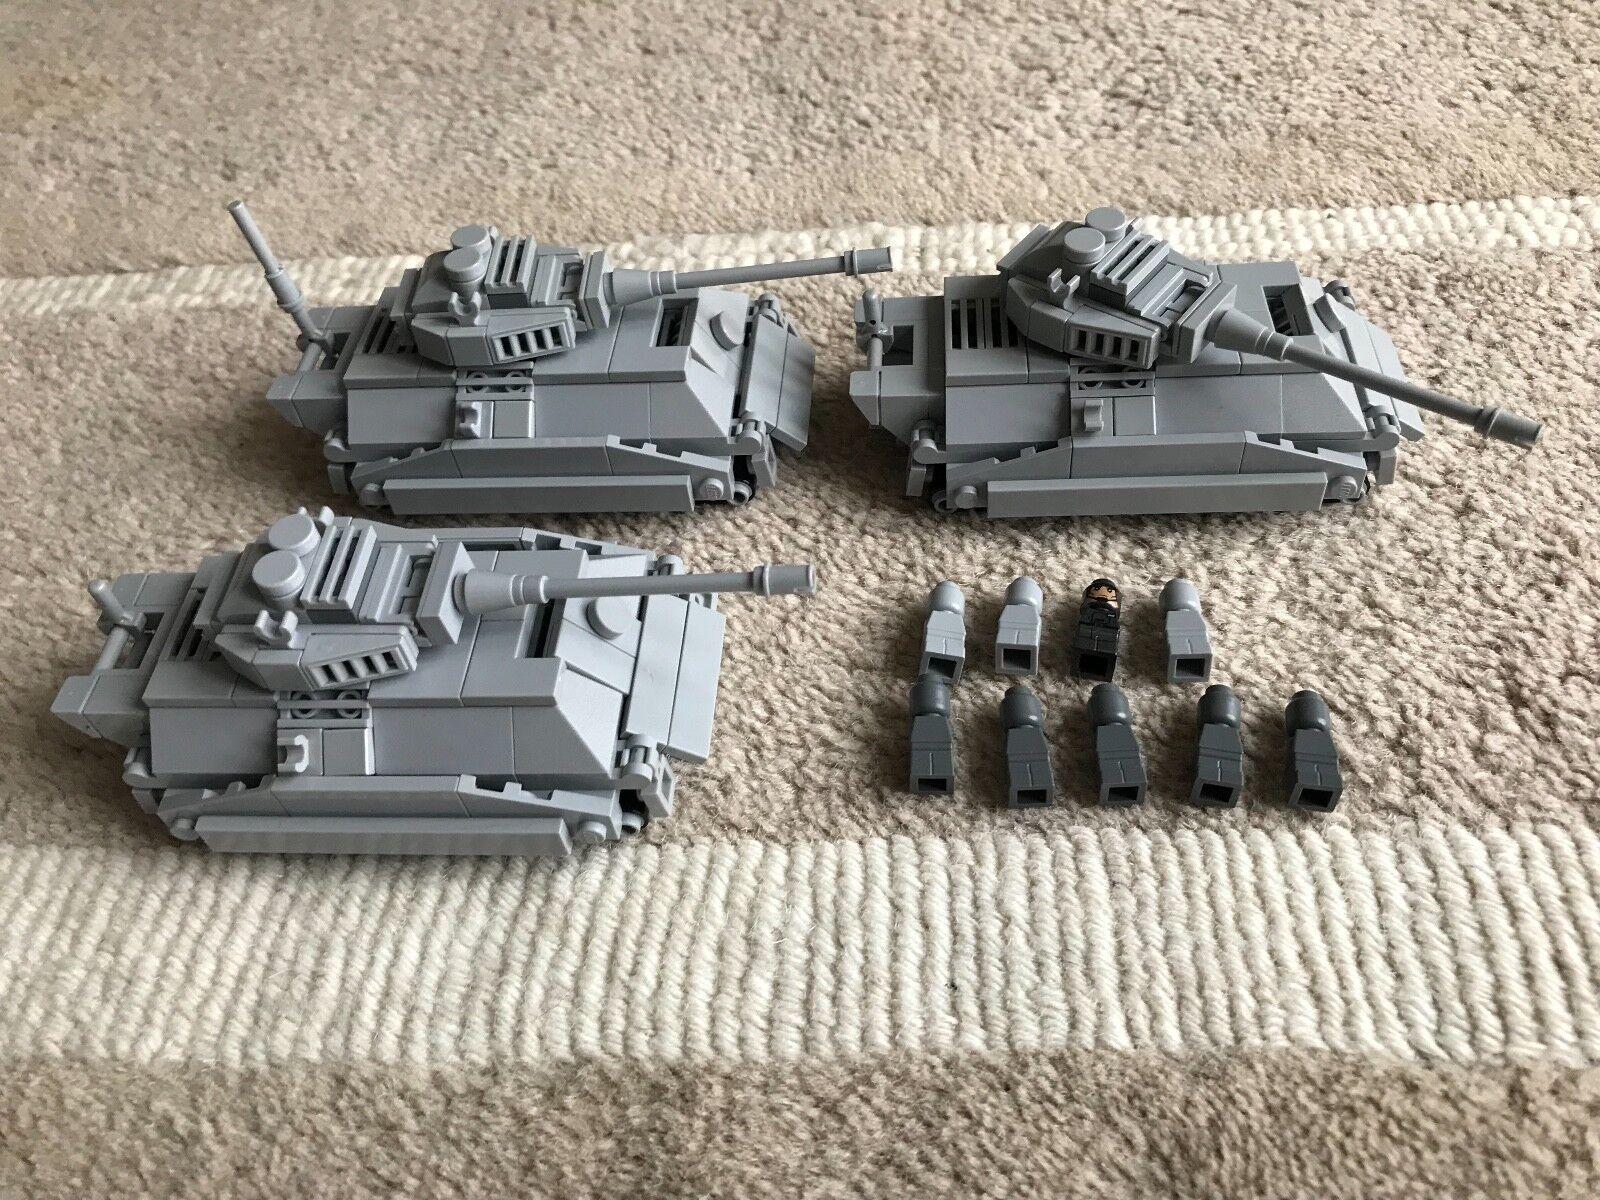 Original LEGO PARTS - MICRO - 3 KING TIGER TANK + 9 soldiers - my design CUSTOM